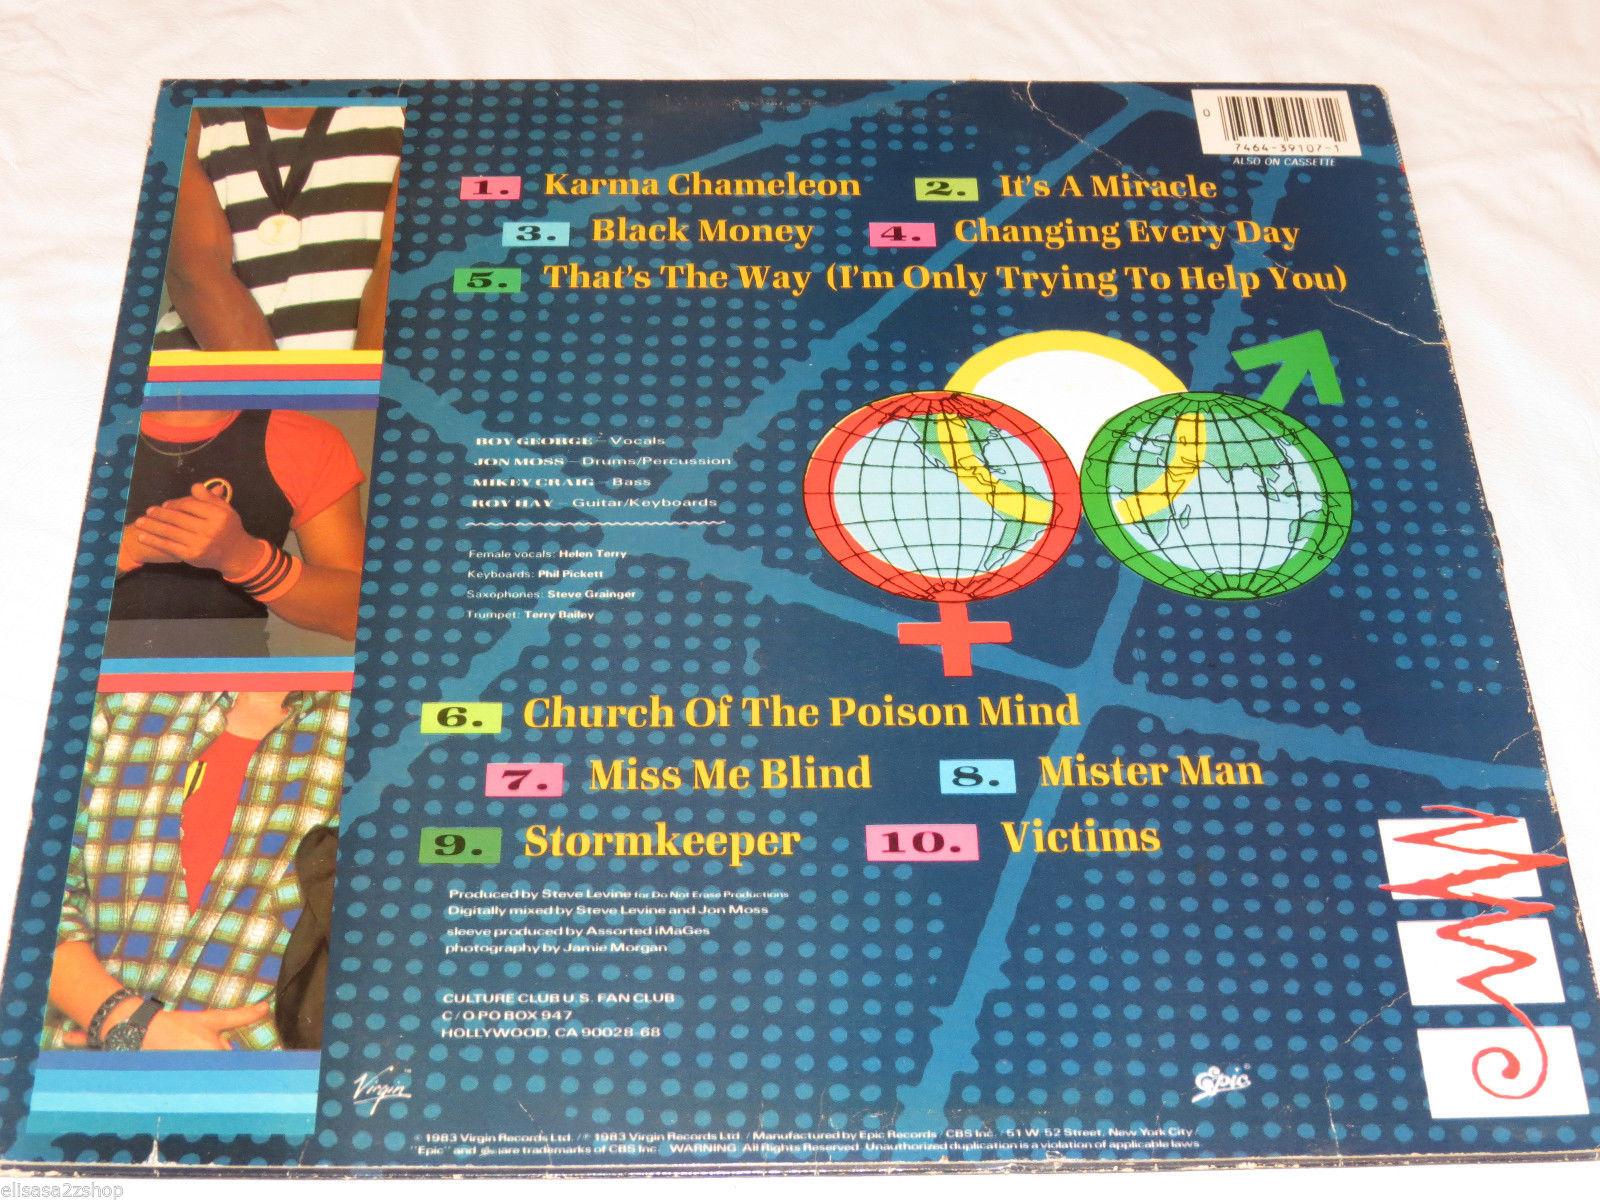 Culture Club Colour By Numbers QE 39107 Epic Records album Record LP vinyl*^